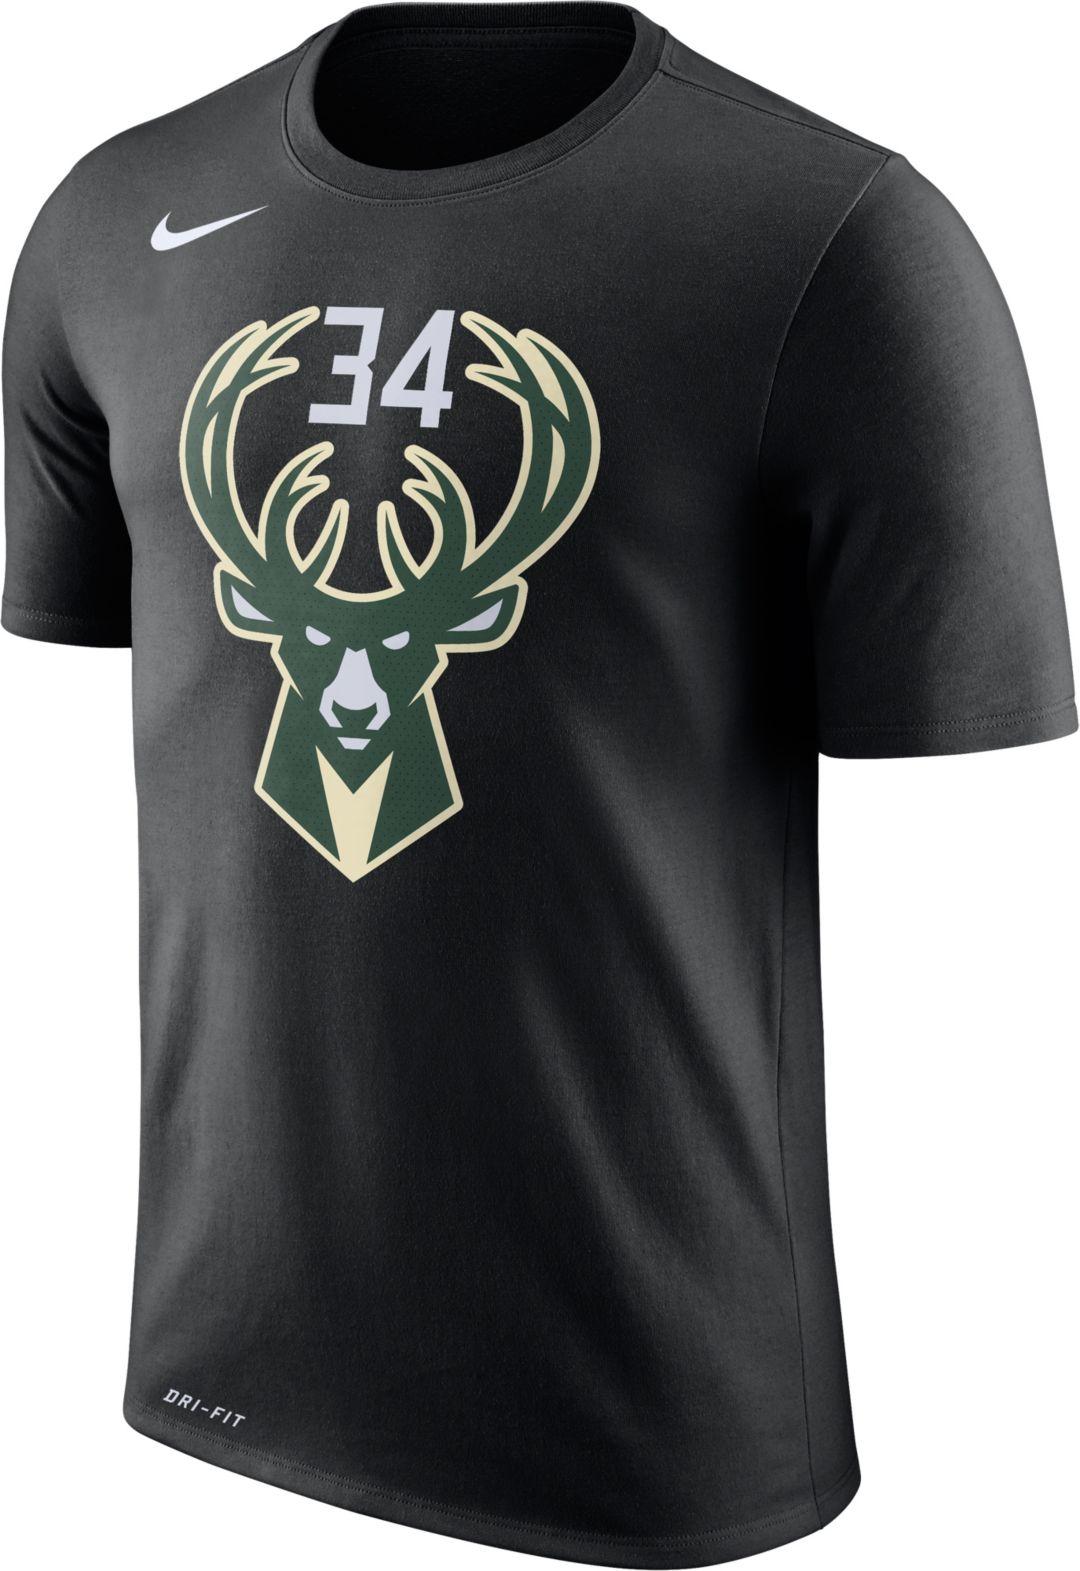 pretty nice 44acd 5fe5e Nike Youth Milwaukee Bucks Giannis Antetokounmpo #34 Dri-FIT Black T-Shirt